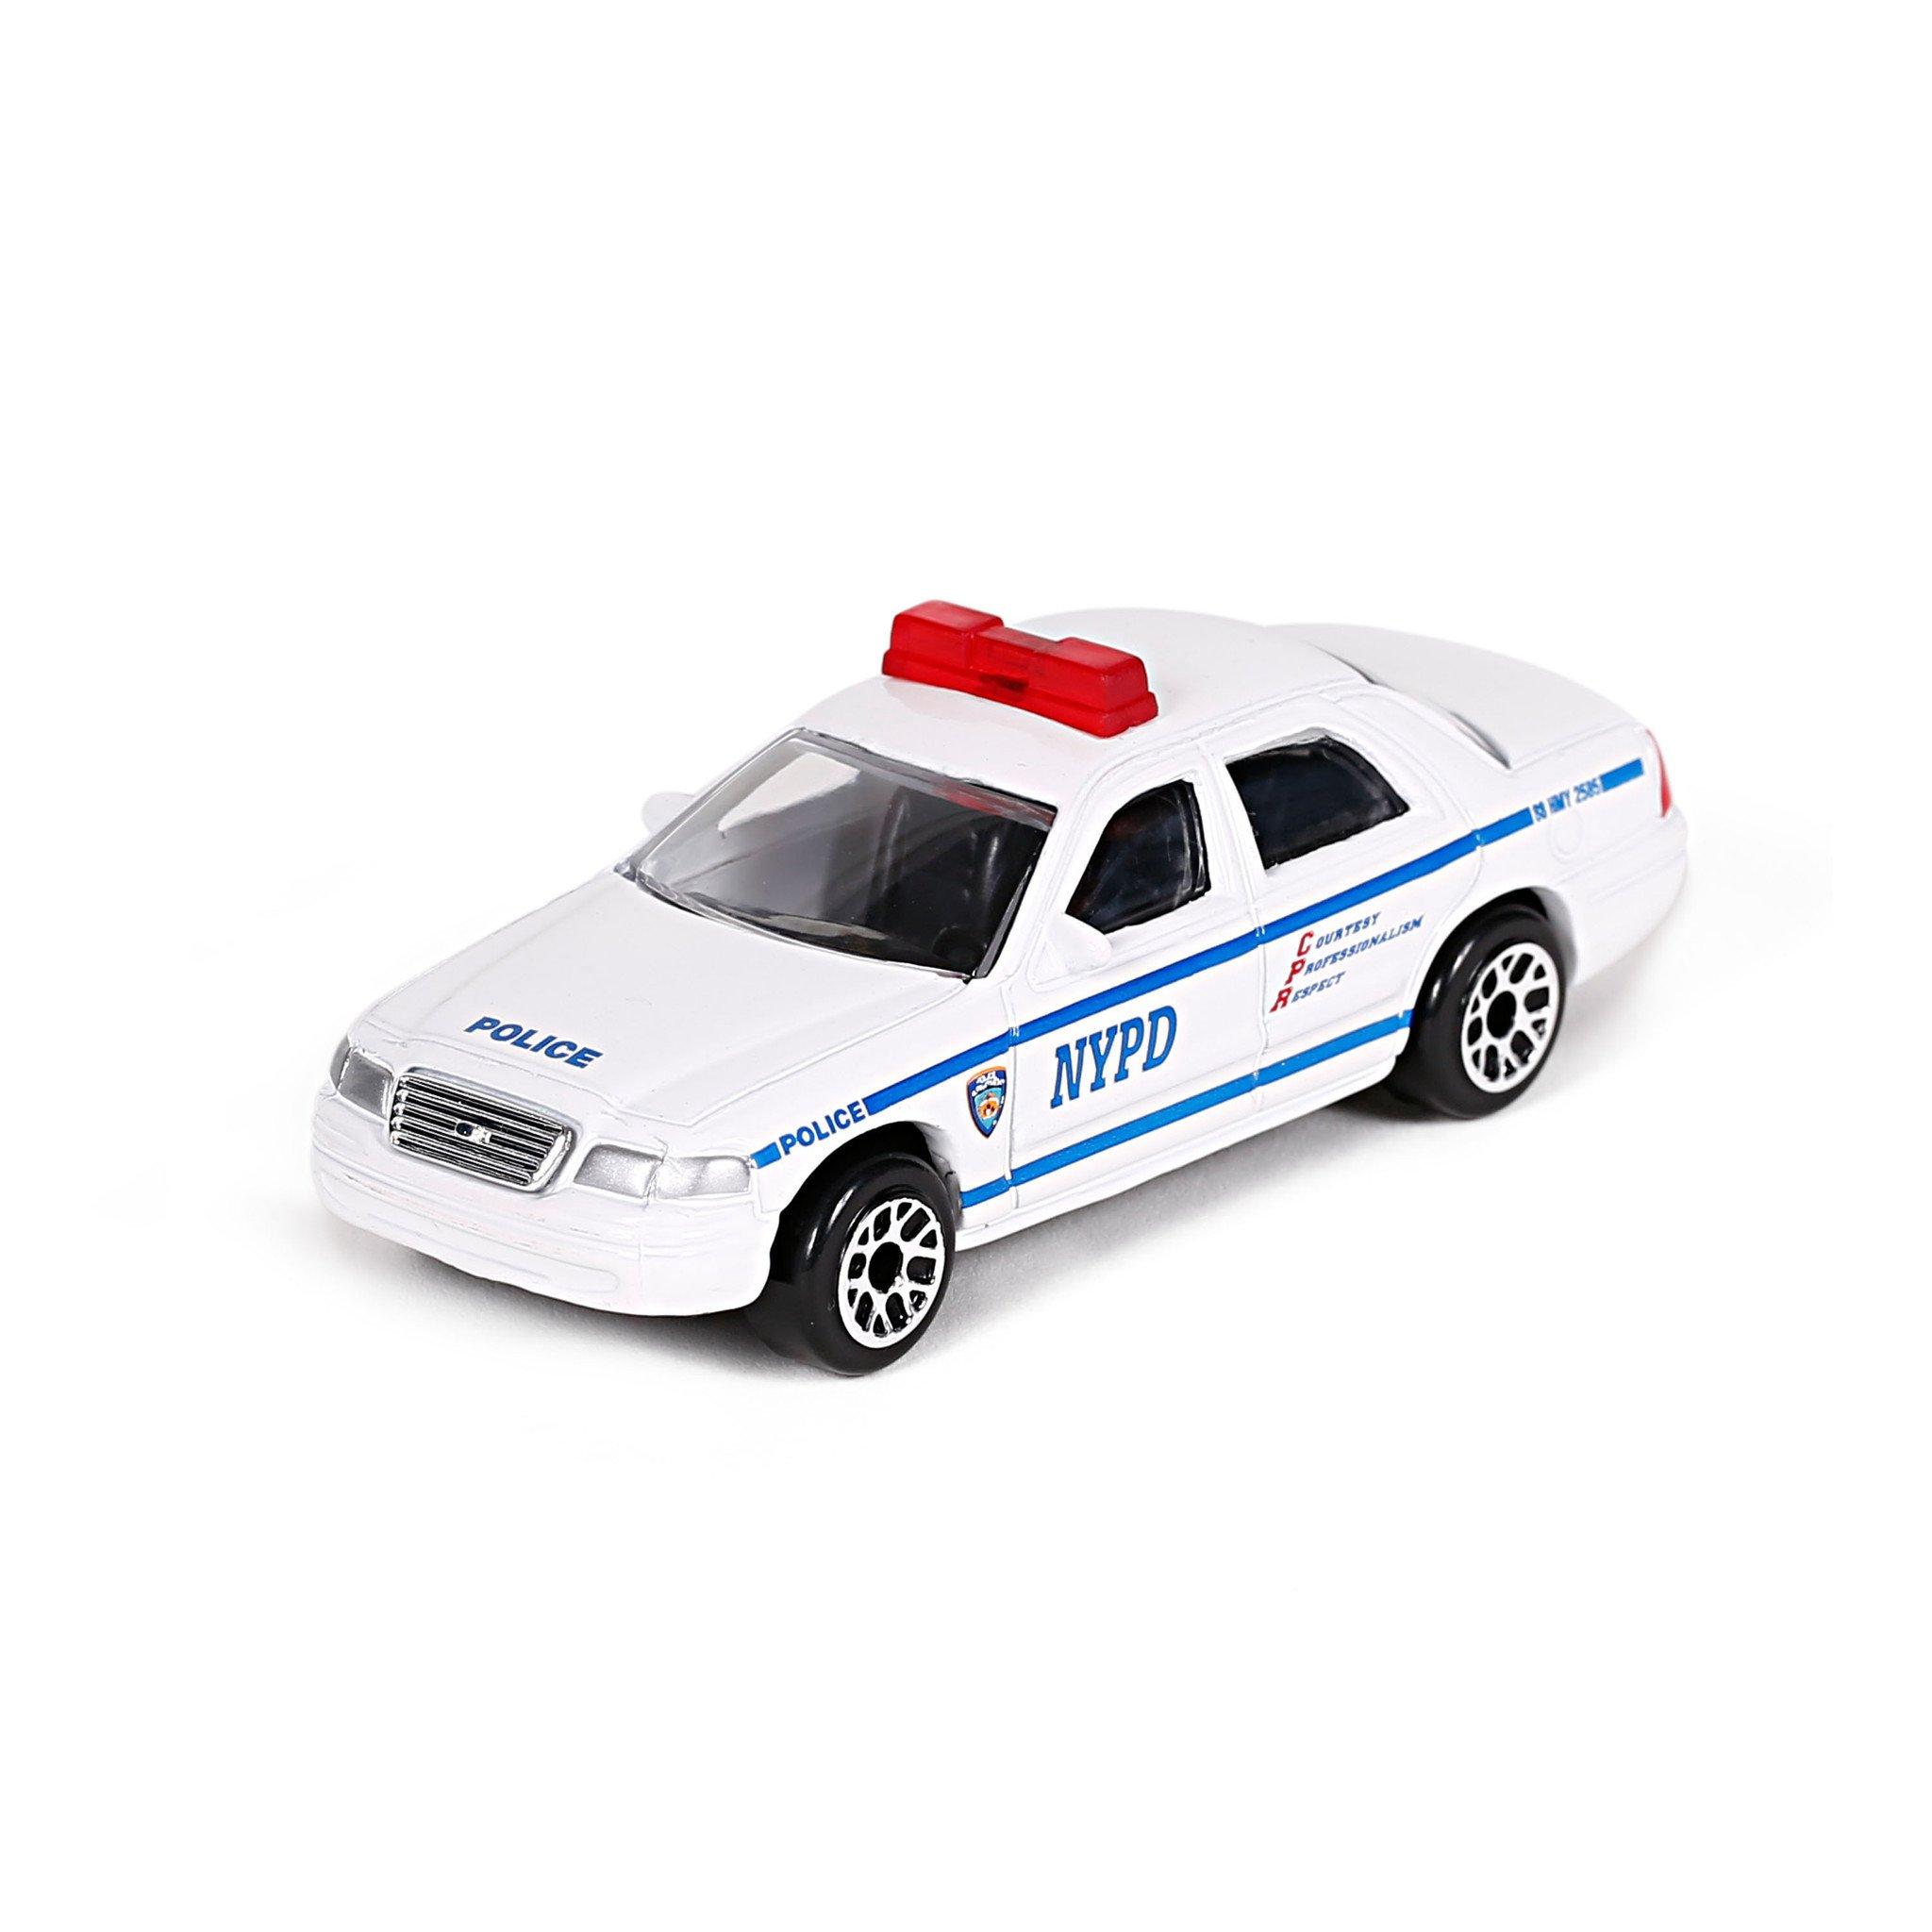 NYPD Police Car – 9/11 Memorial Museum Store